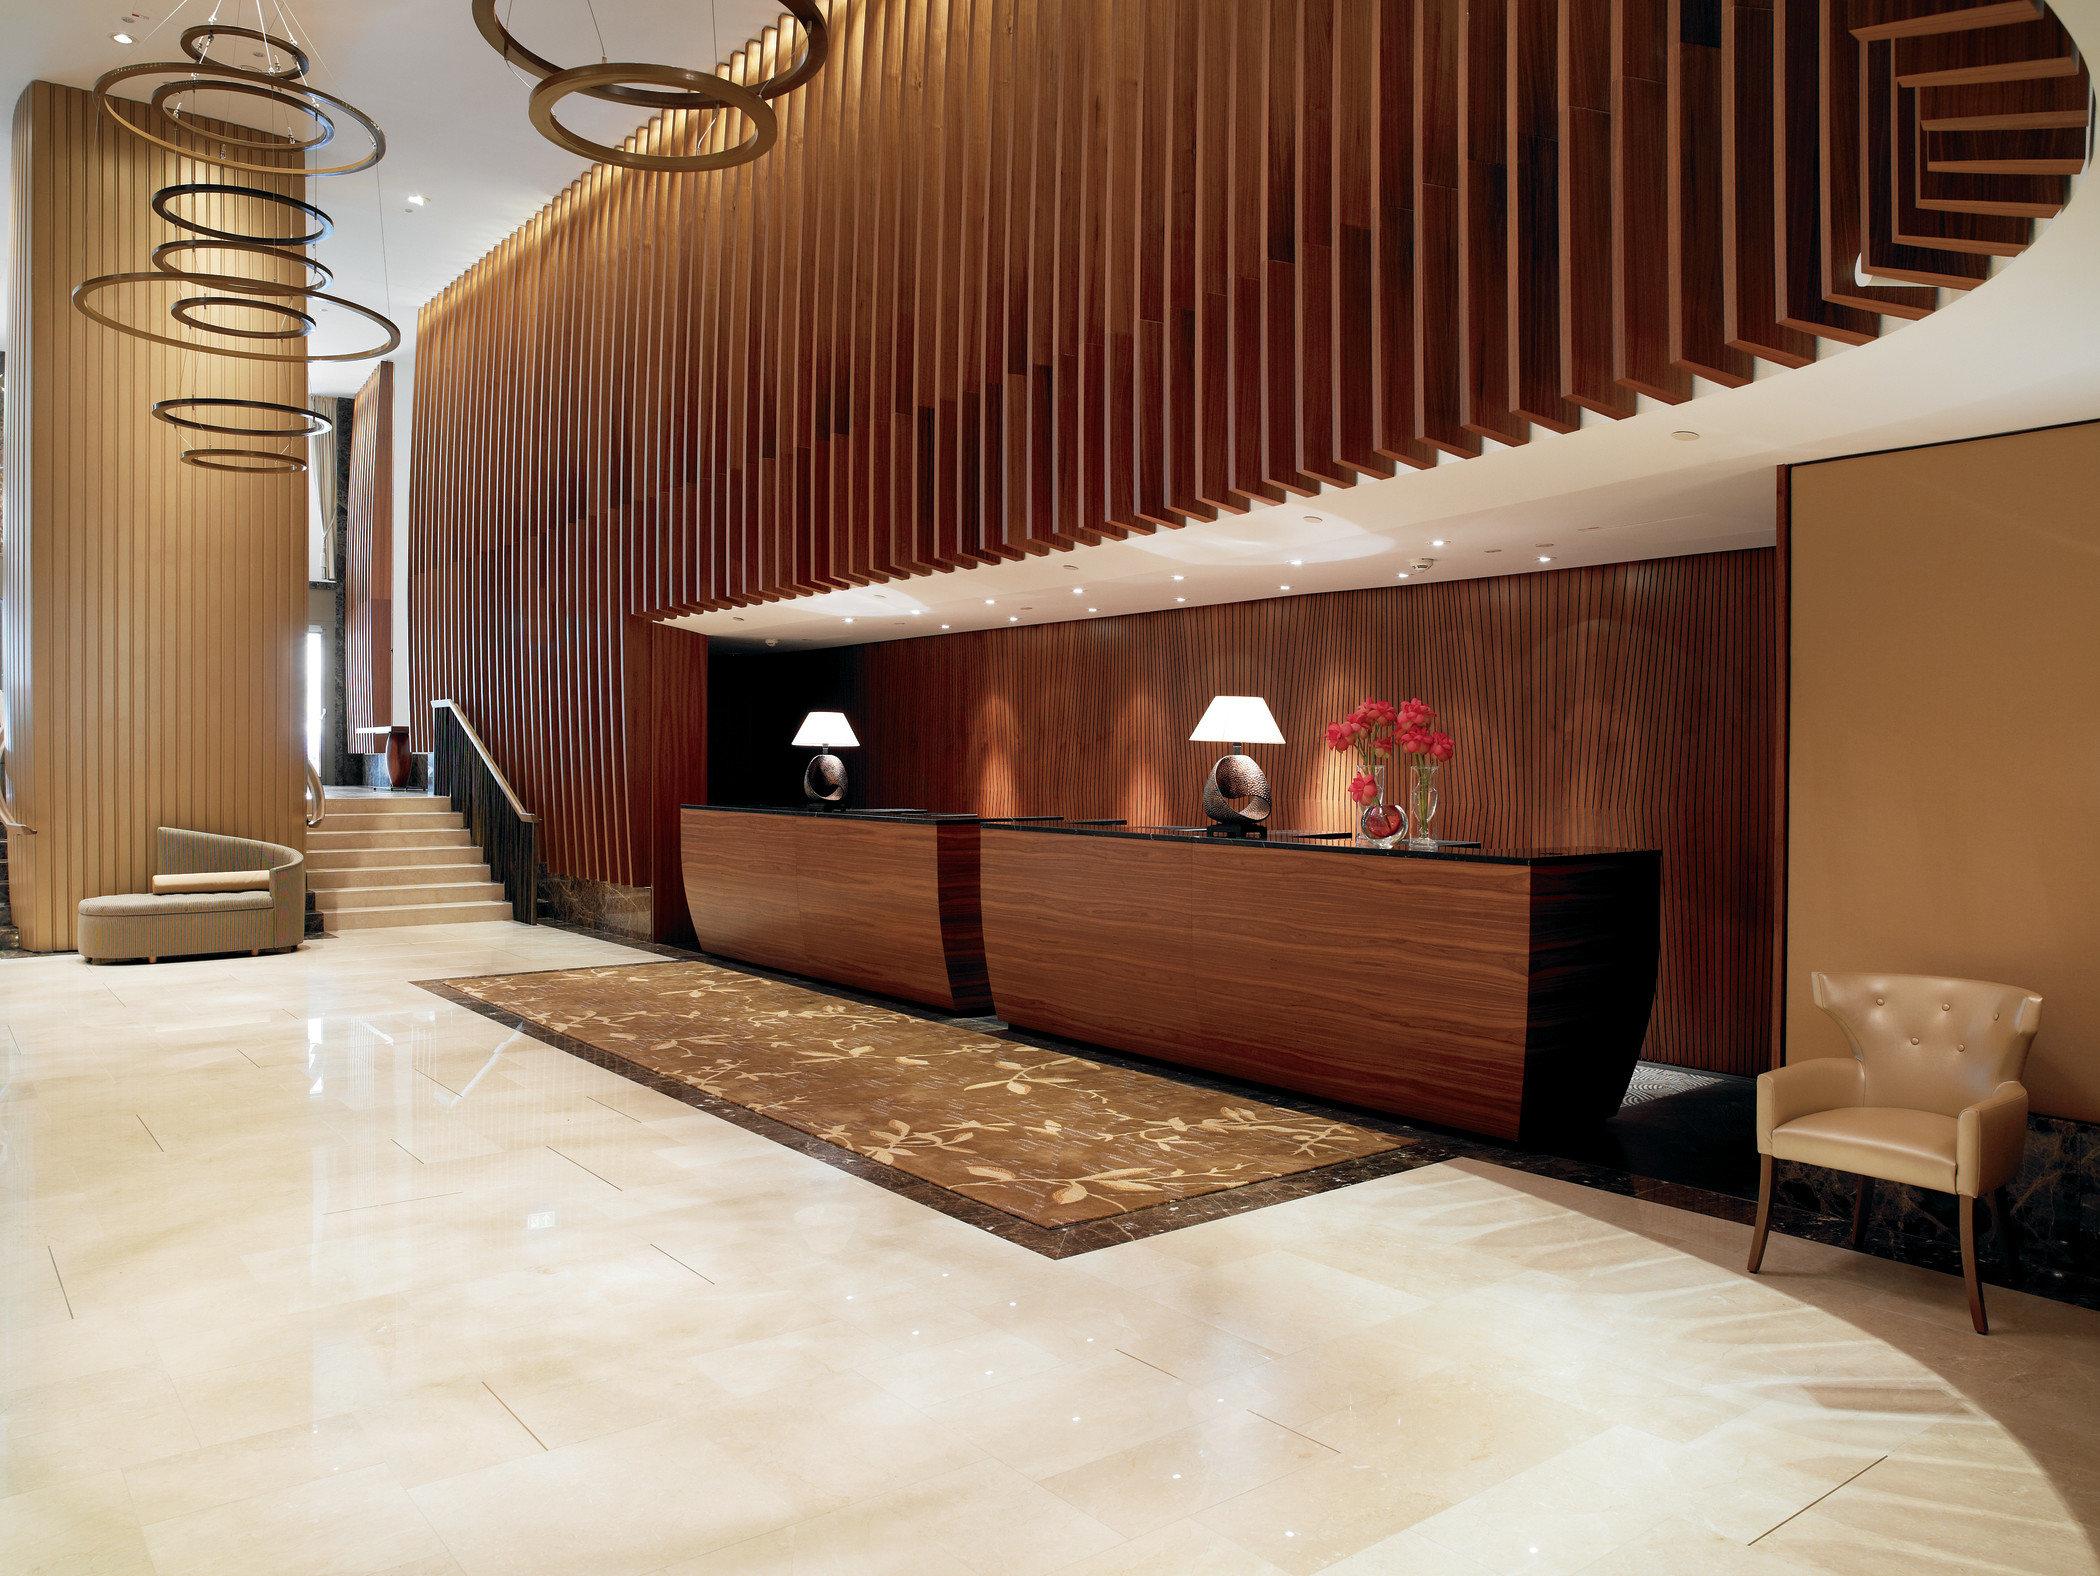 Lobby flooring Architecture hardwood wood flooring laminate flooring stairs interior designer hall